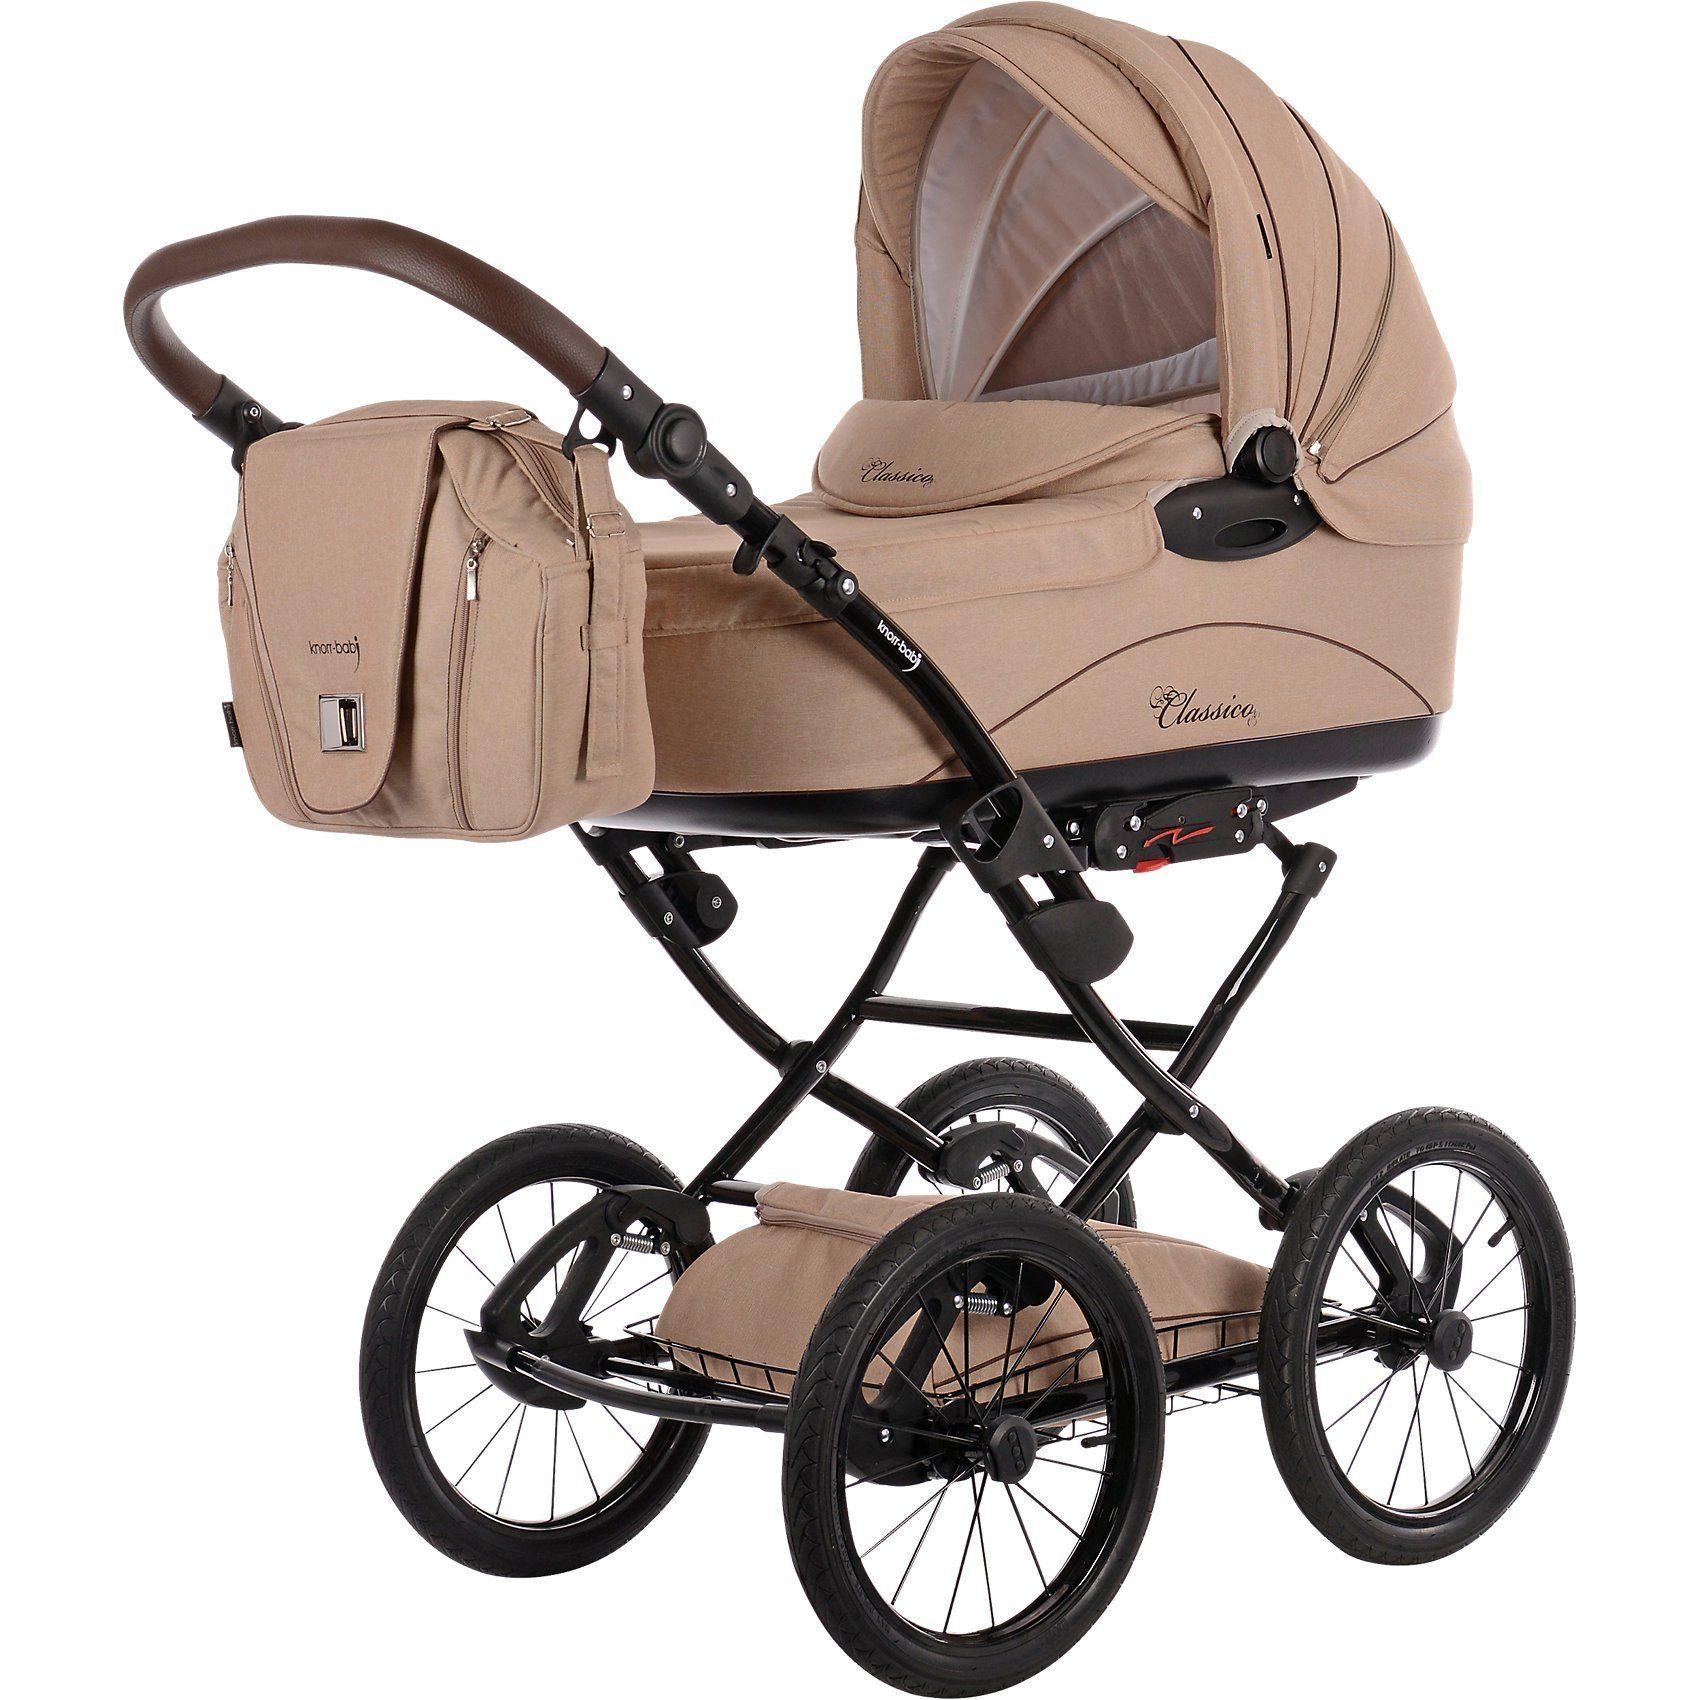 knorr-baby Kombi Kinderwagen Classico mit Wickeltasche & Handwärmer, cr